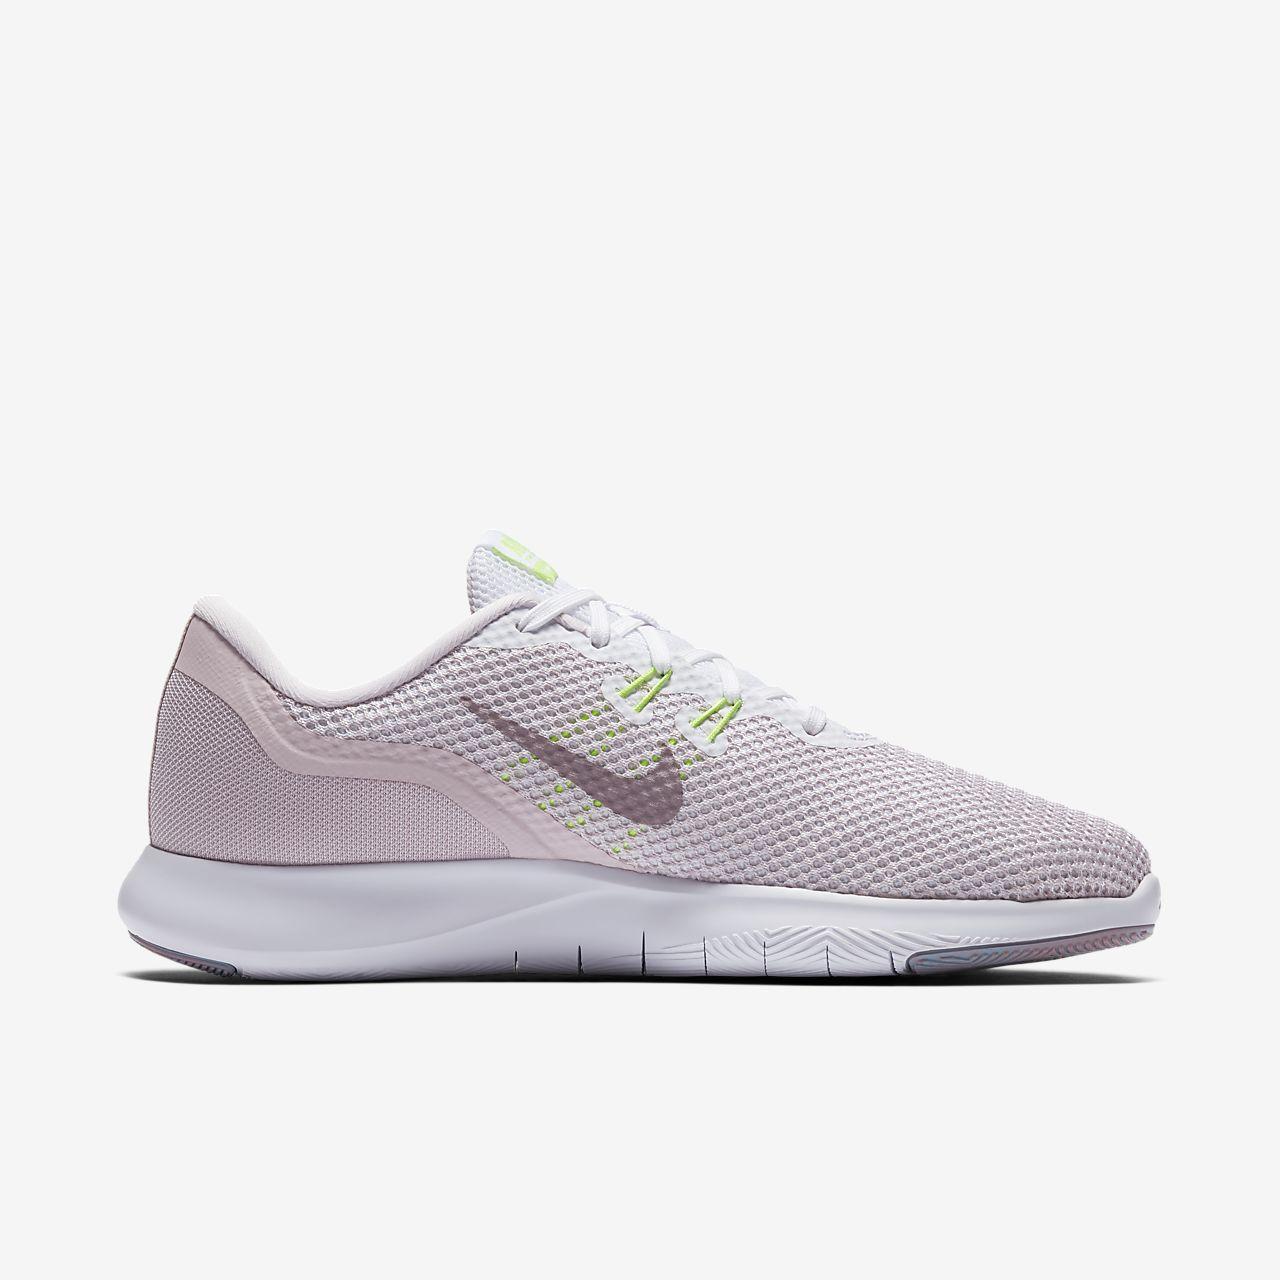 6e2ca961b09 Nike Flex Trainer 7 Women s Gym Dance Aerobics Shoe. Nike.com GB